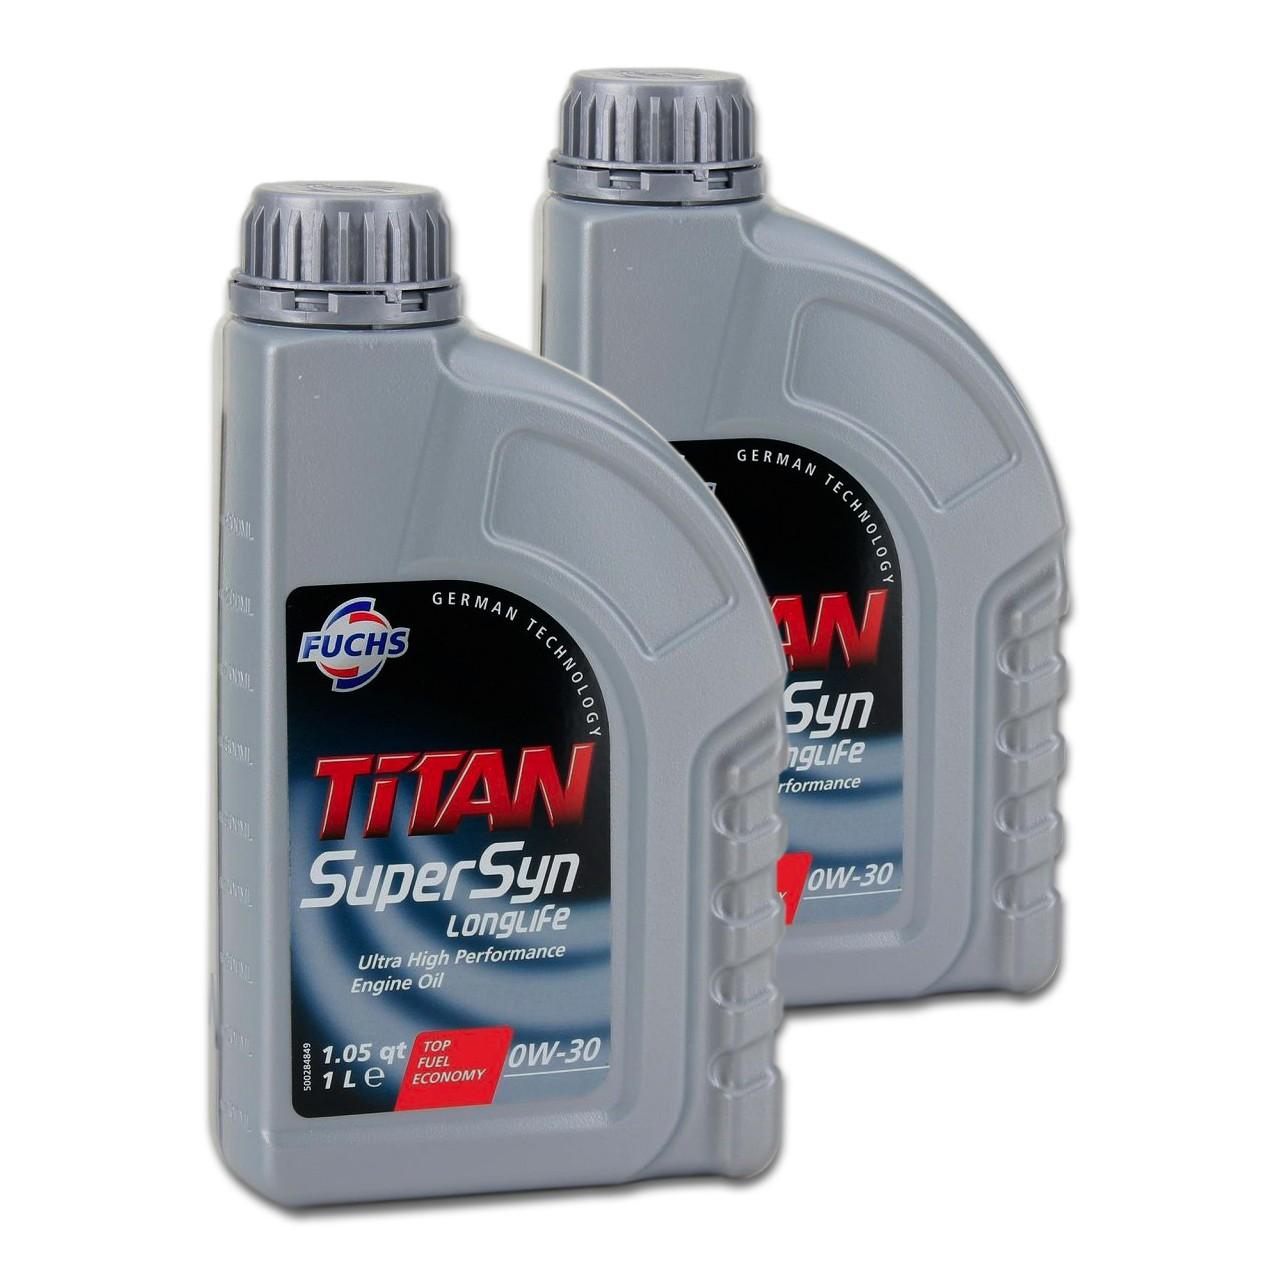 FUCHS Motoröl ÖL TITAN SUPERSYN LONGLIFE 0W30 MB 229.5 VW 502/505.00 - 2 Liter